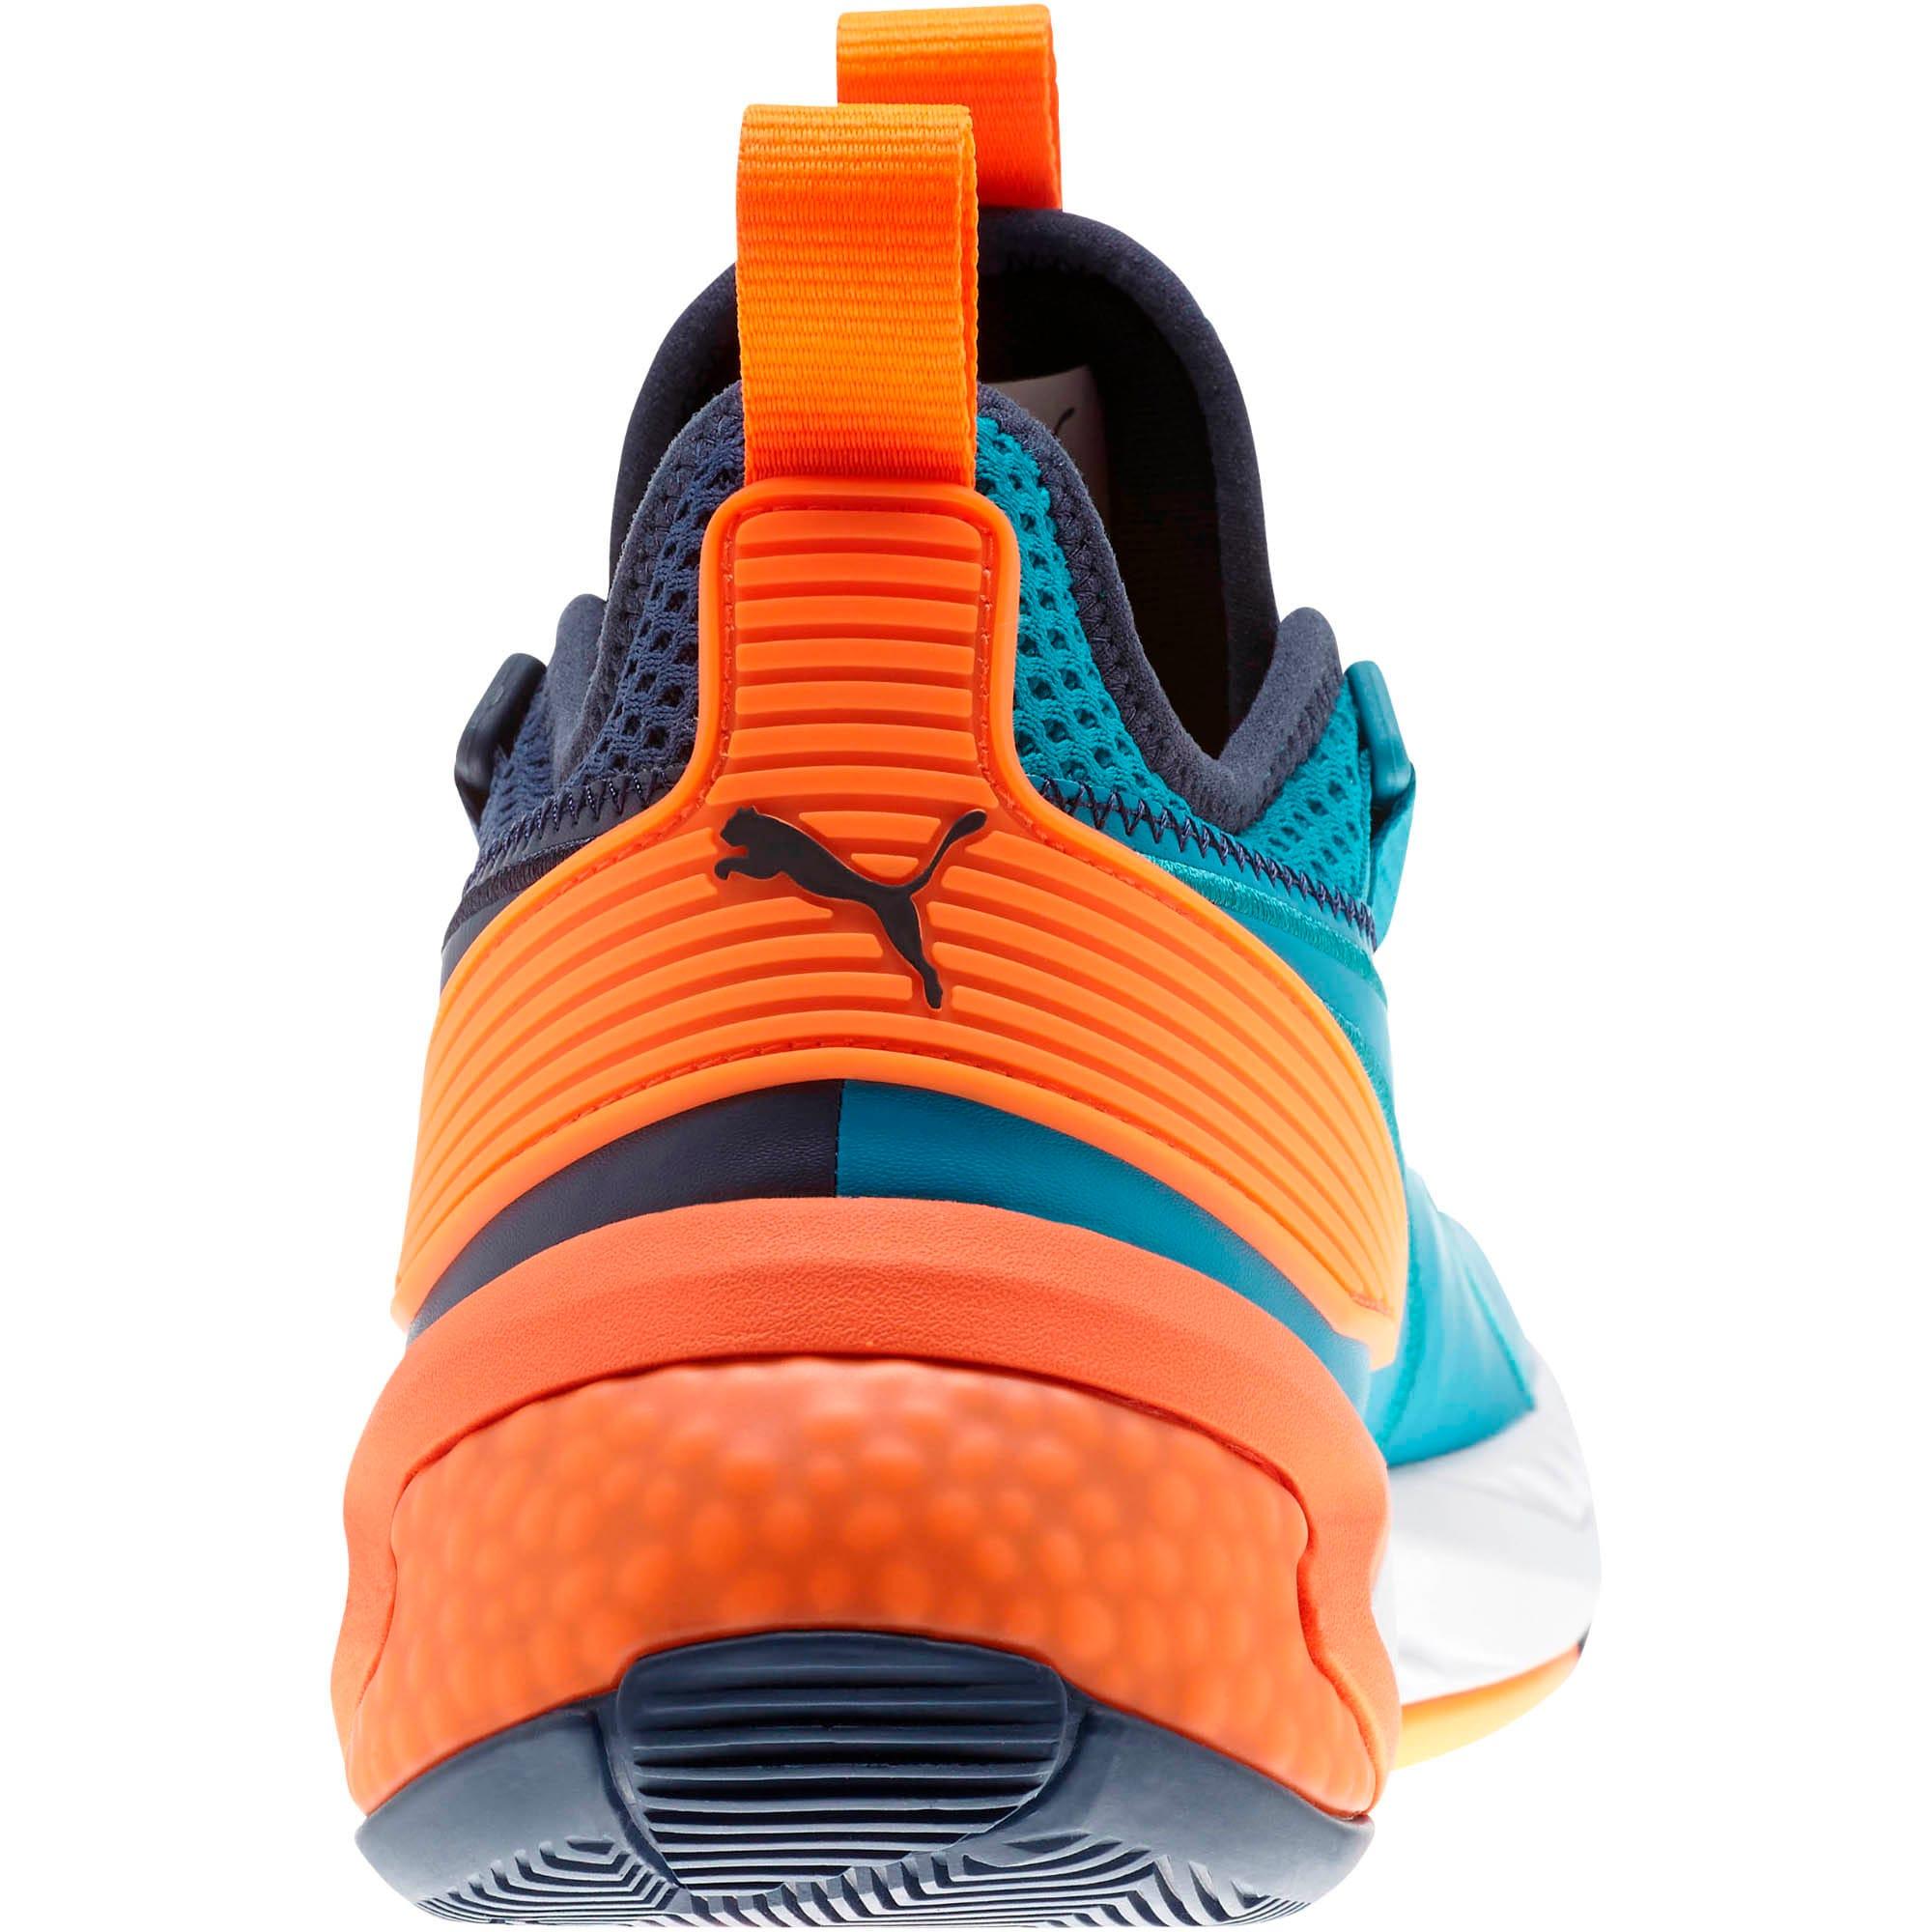 Thumbnail 4 of Uproar Charlotte ASG Fade Basketball Shoes, Orange- PURPLE, medium